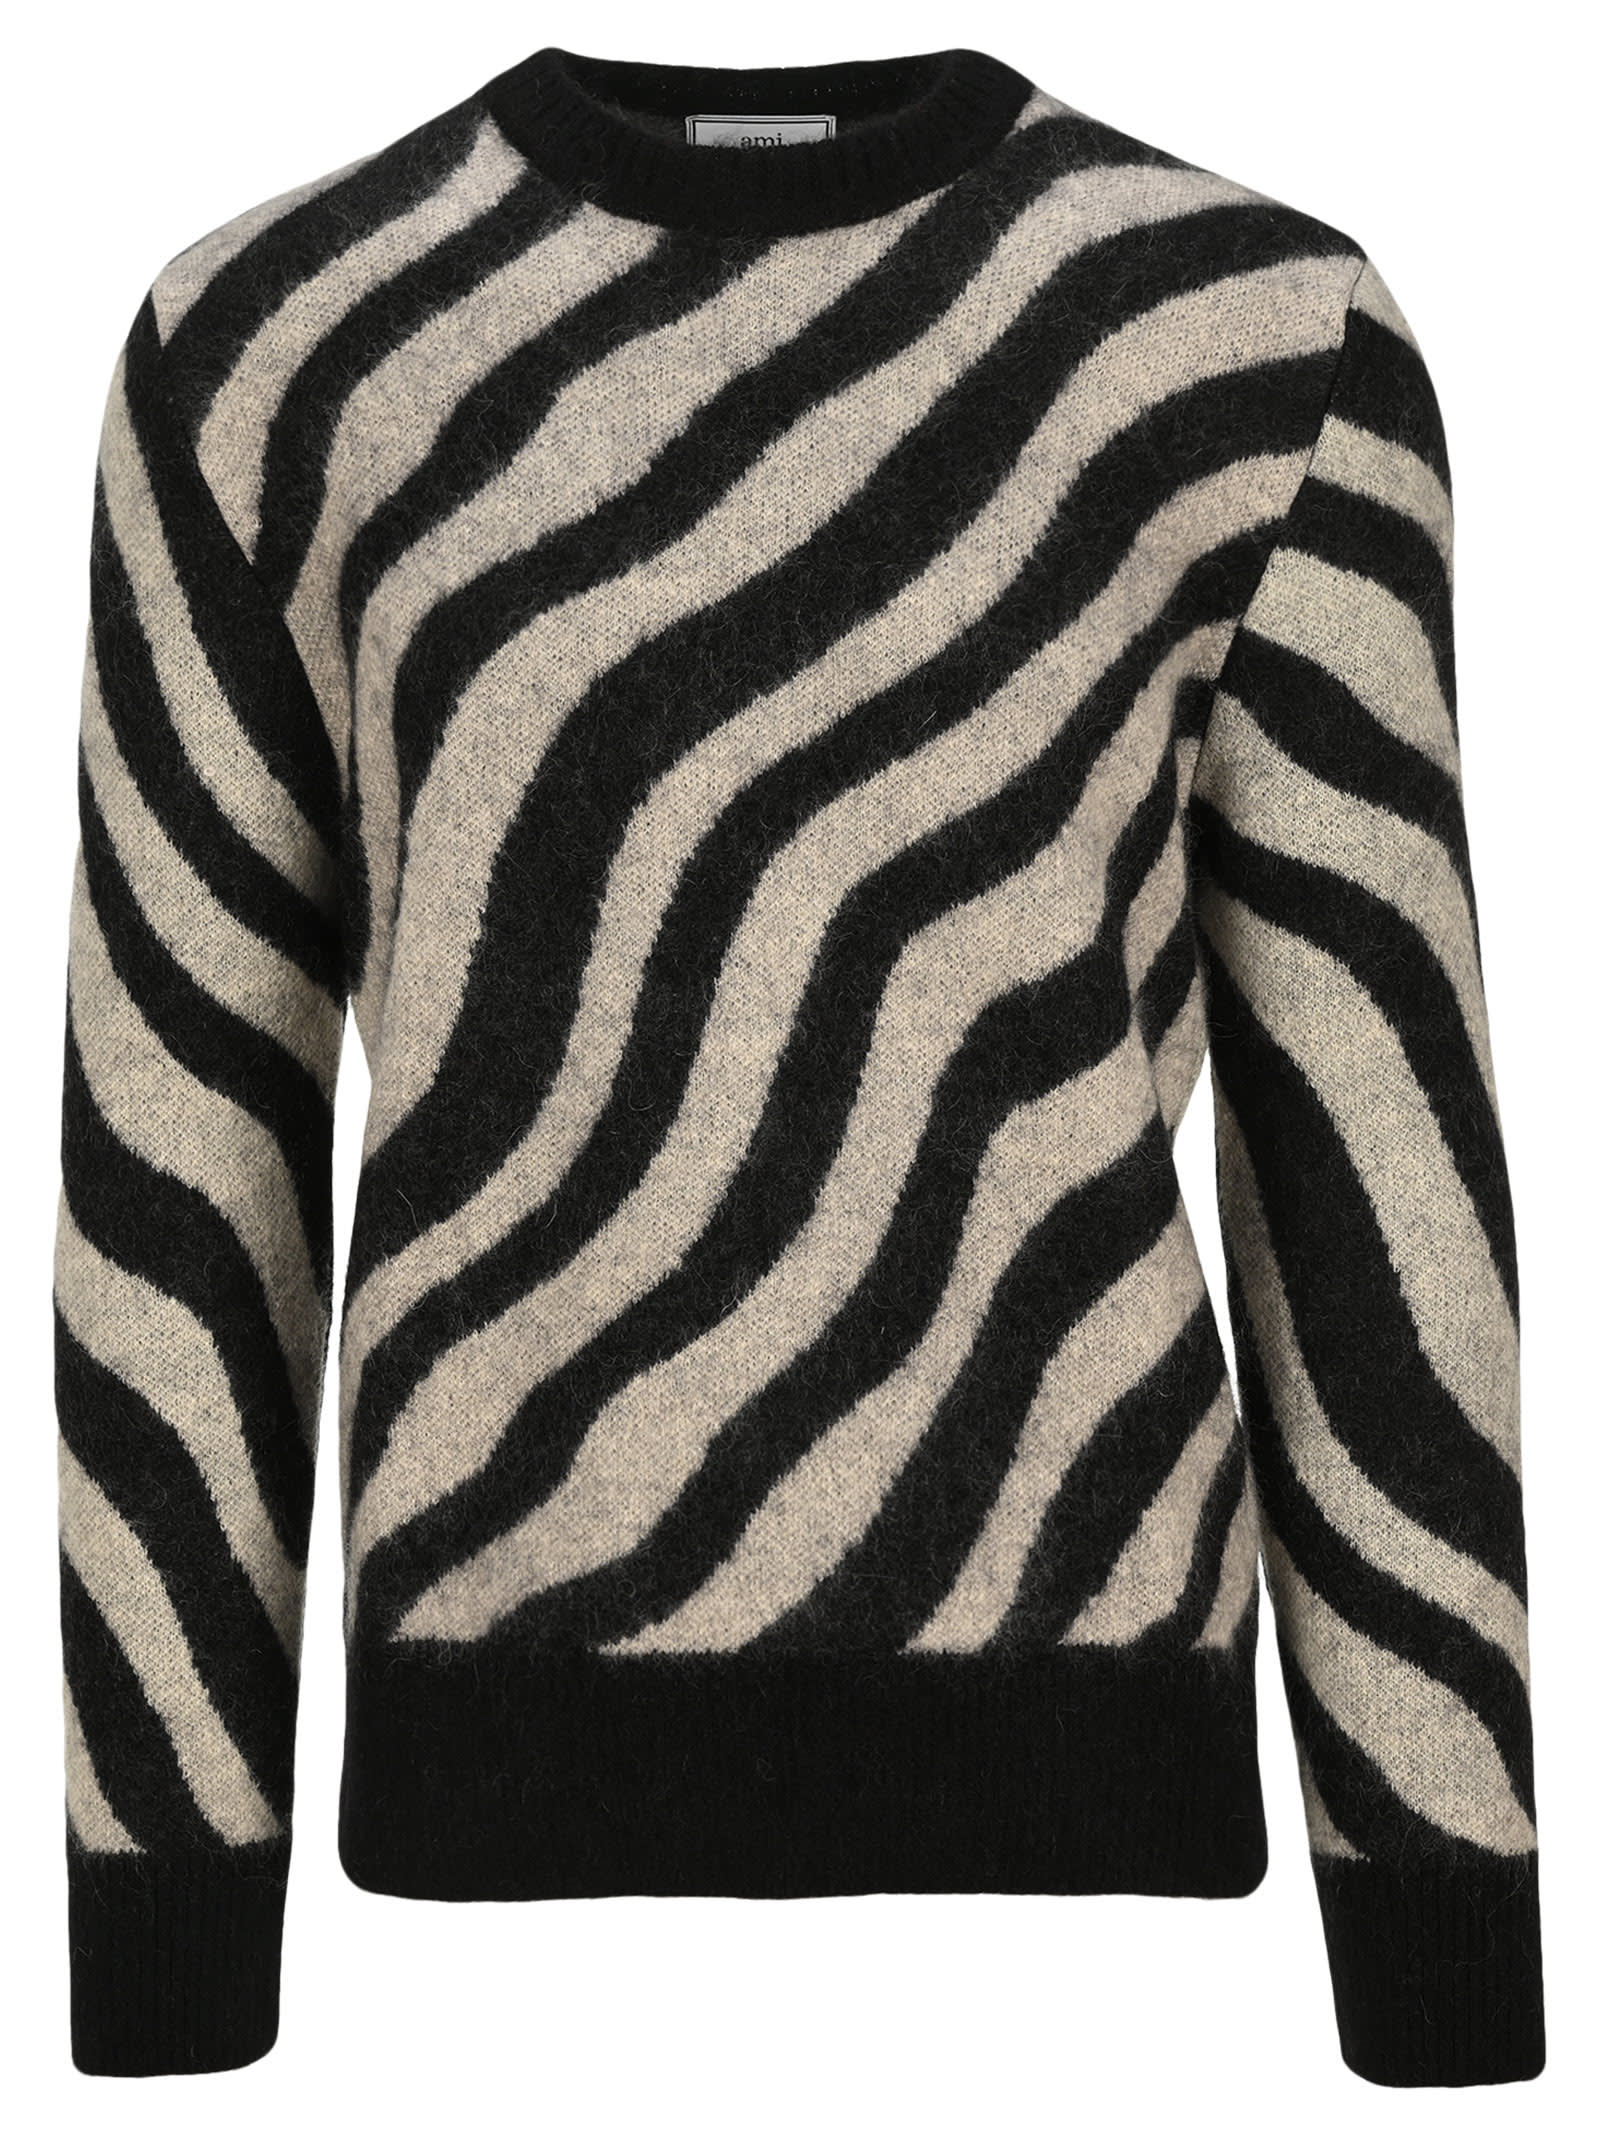 Ami Alexandre Mattiussi Sweaters AMI ZEBRA STRIPED SWEATER